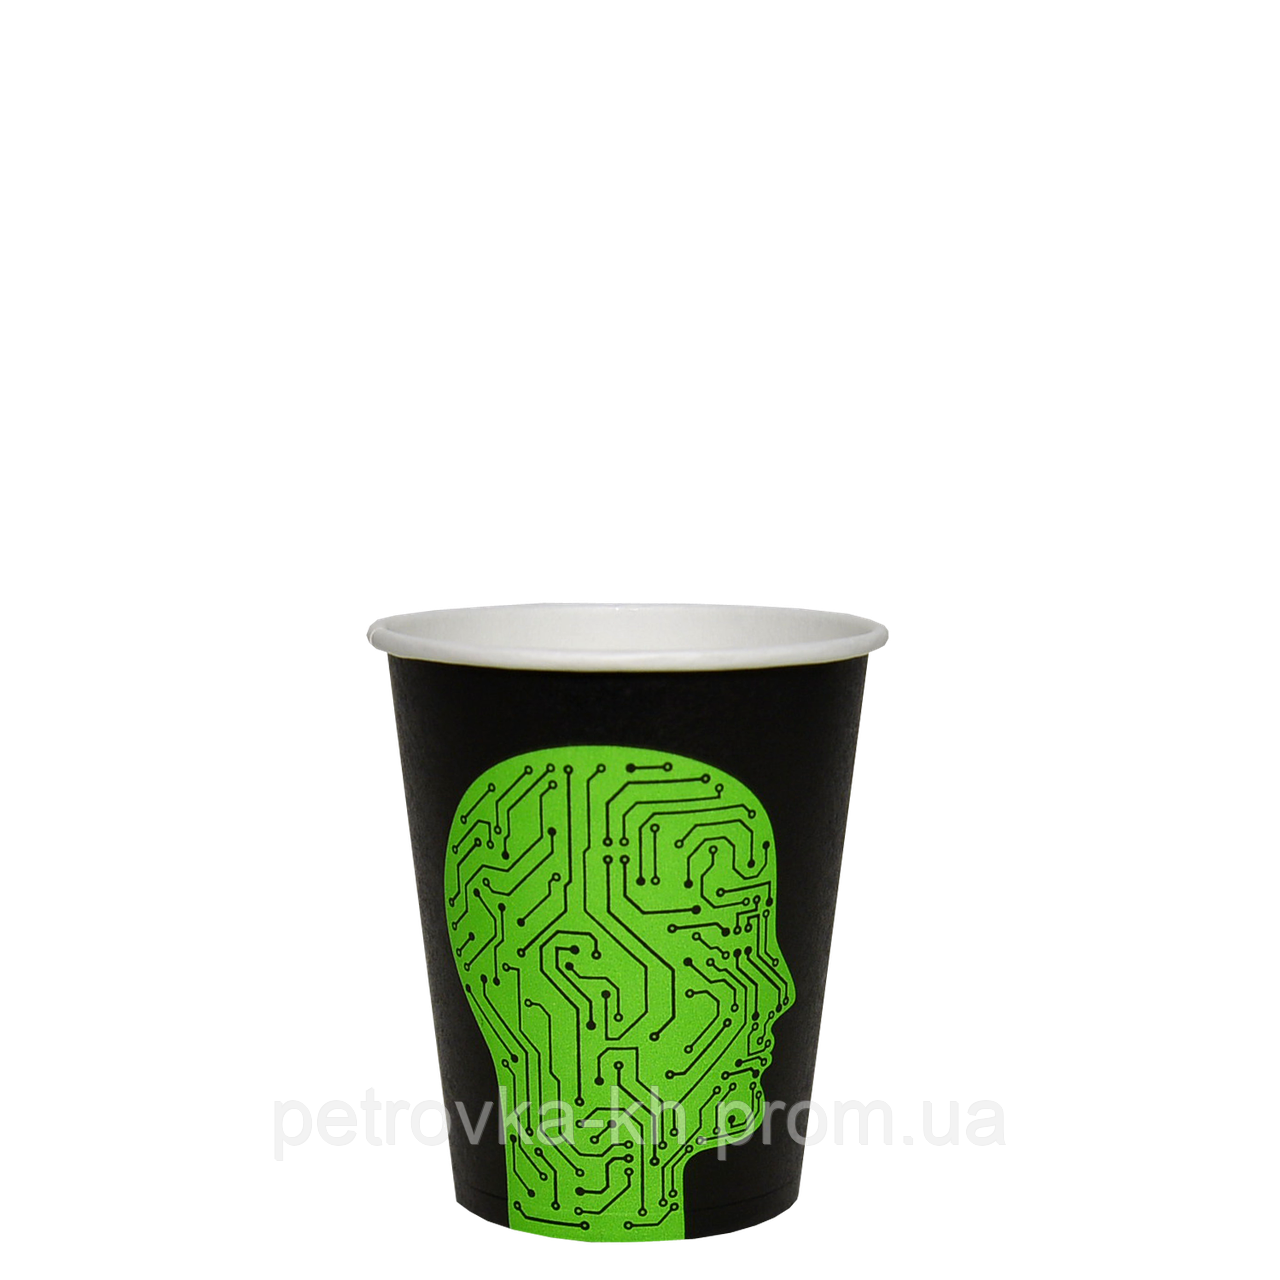 "Одноразовый стакан, серия ""Проскануй"", 175мл. 50шт/уп (1ящ/20уп/1000шт) под крышку КВ71/""РОМБ"" 71"